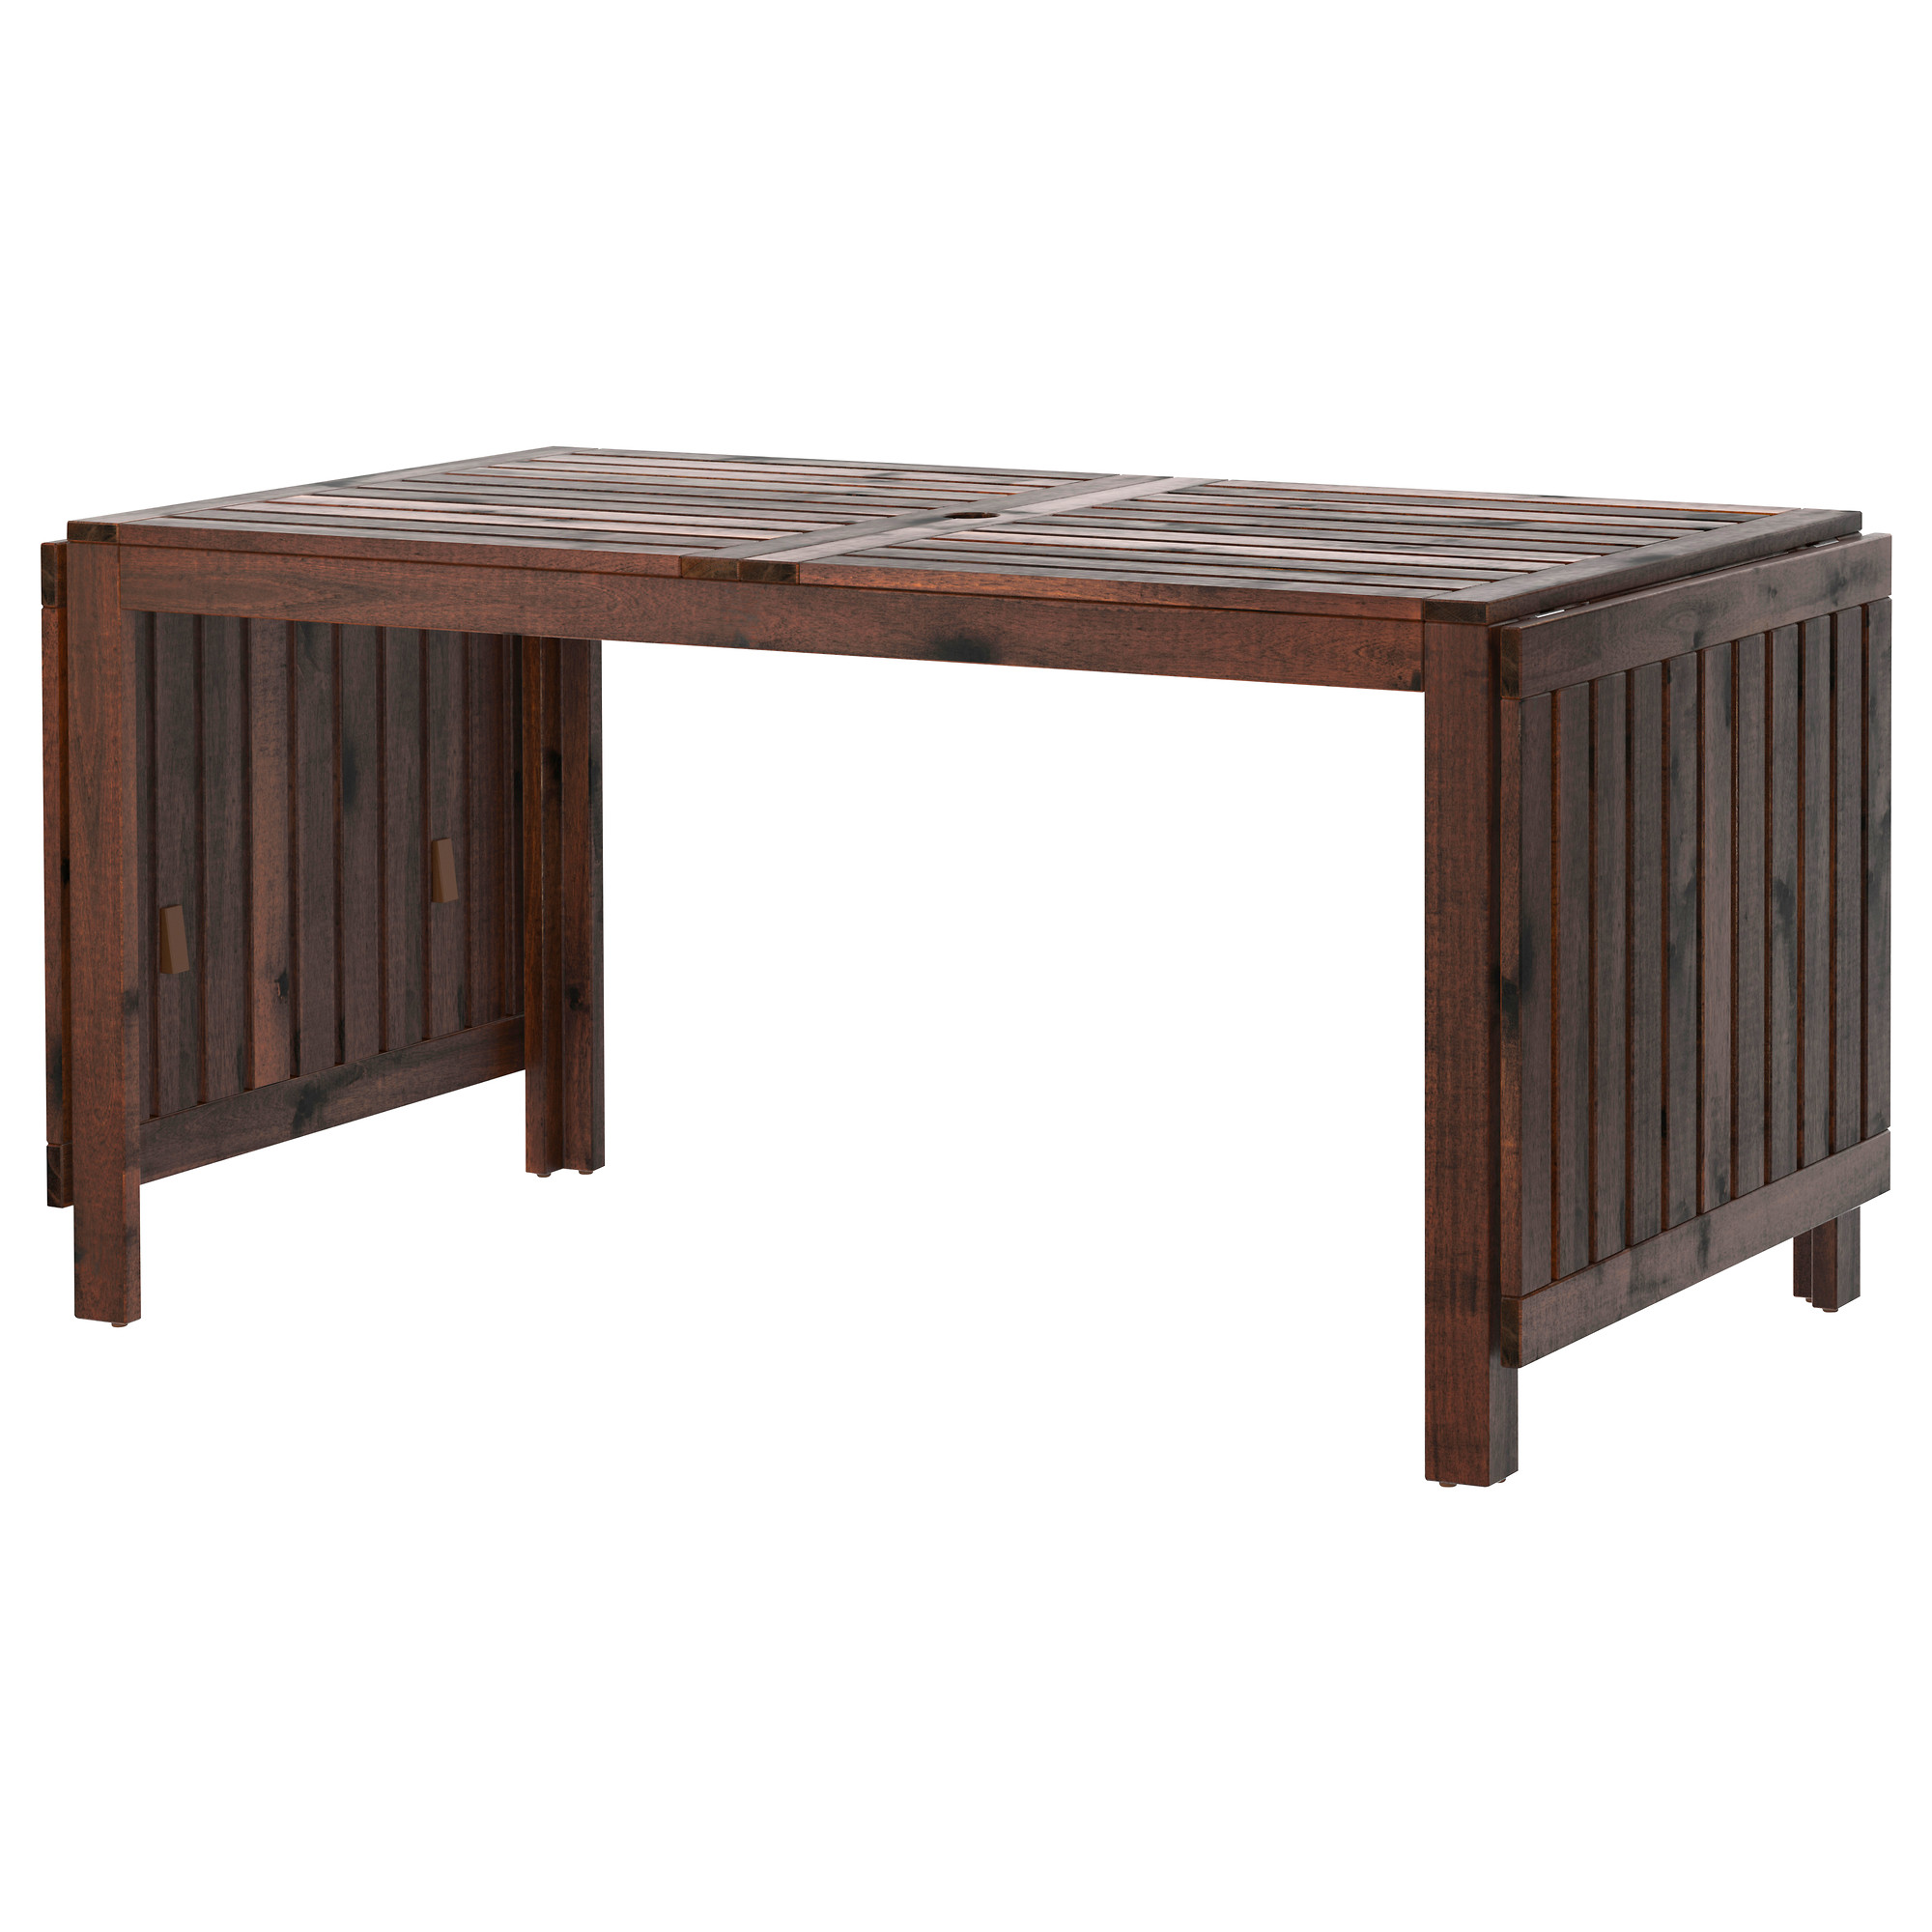 outdoor table äpplarö drop-leaf table, outdoor - ikea FNUEILG